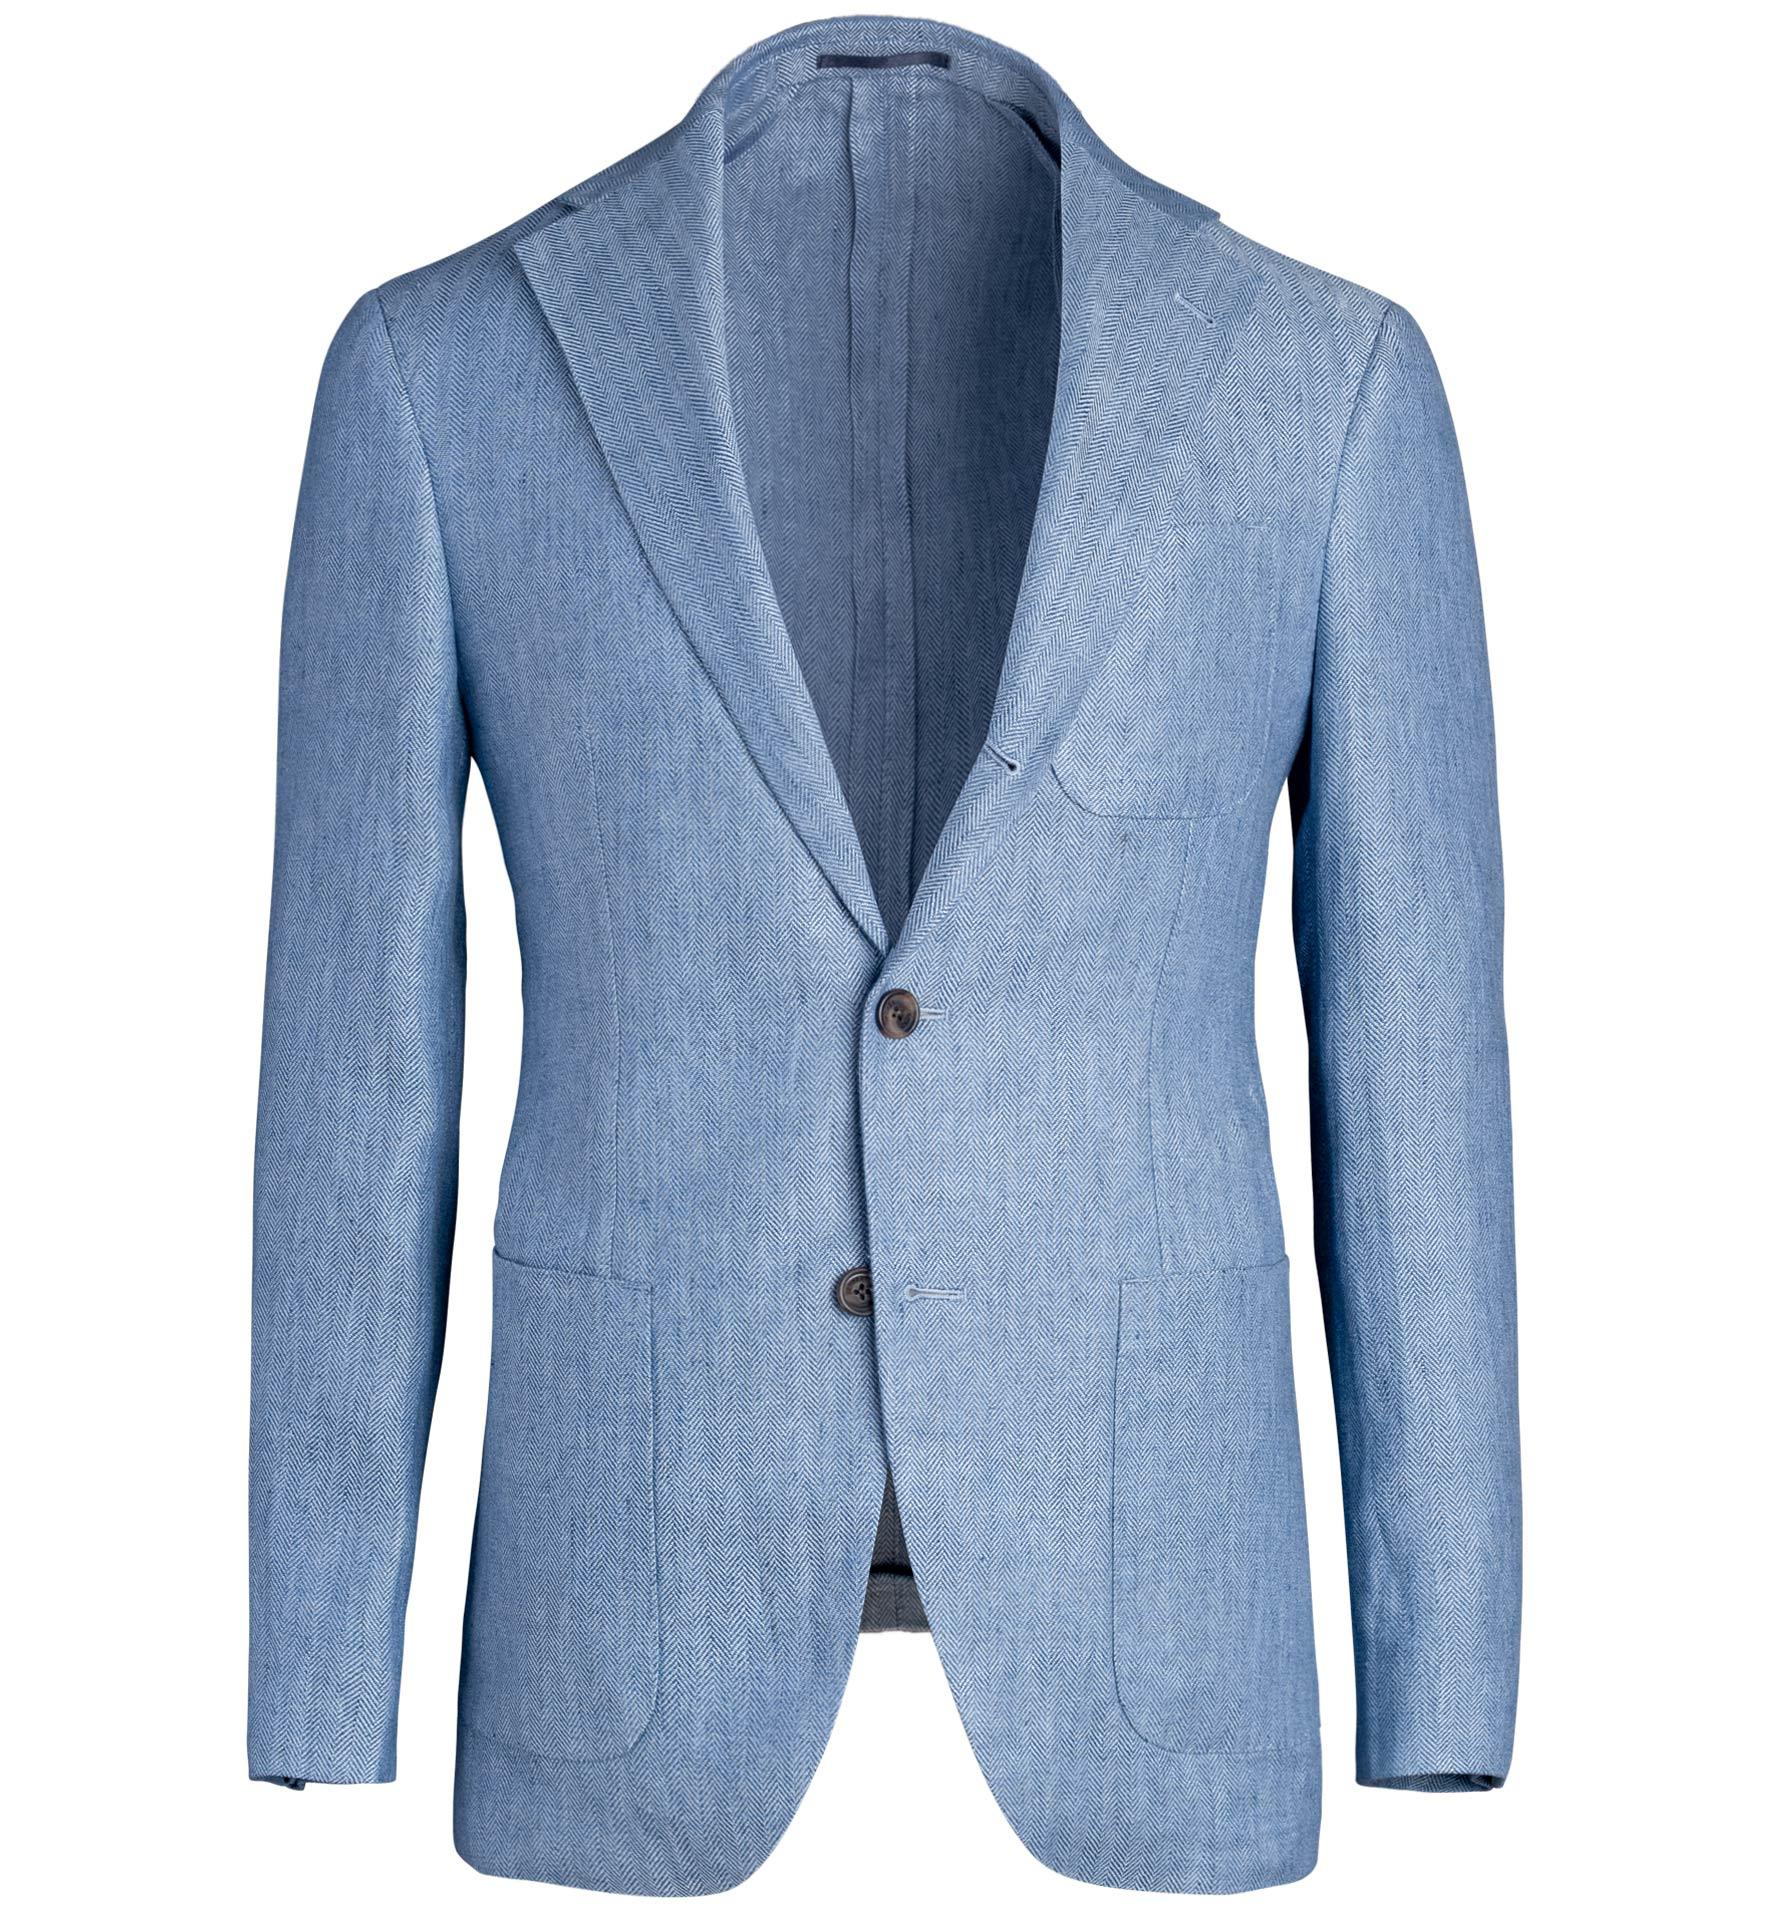 Zoom Image of Waverly Light Blue Linen Herringbone Jacket